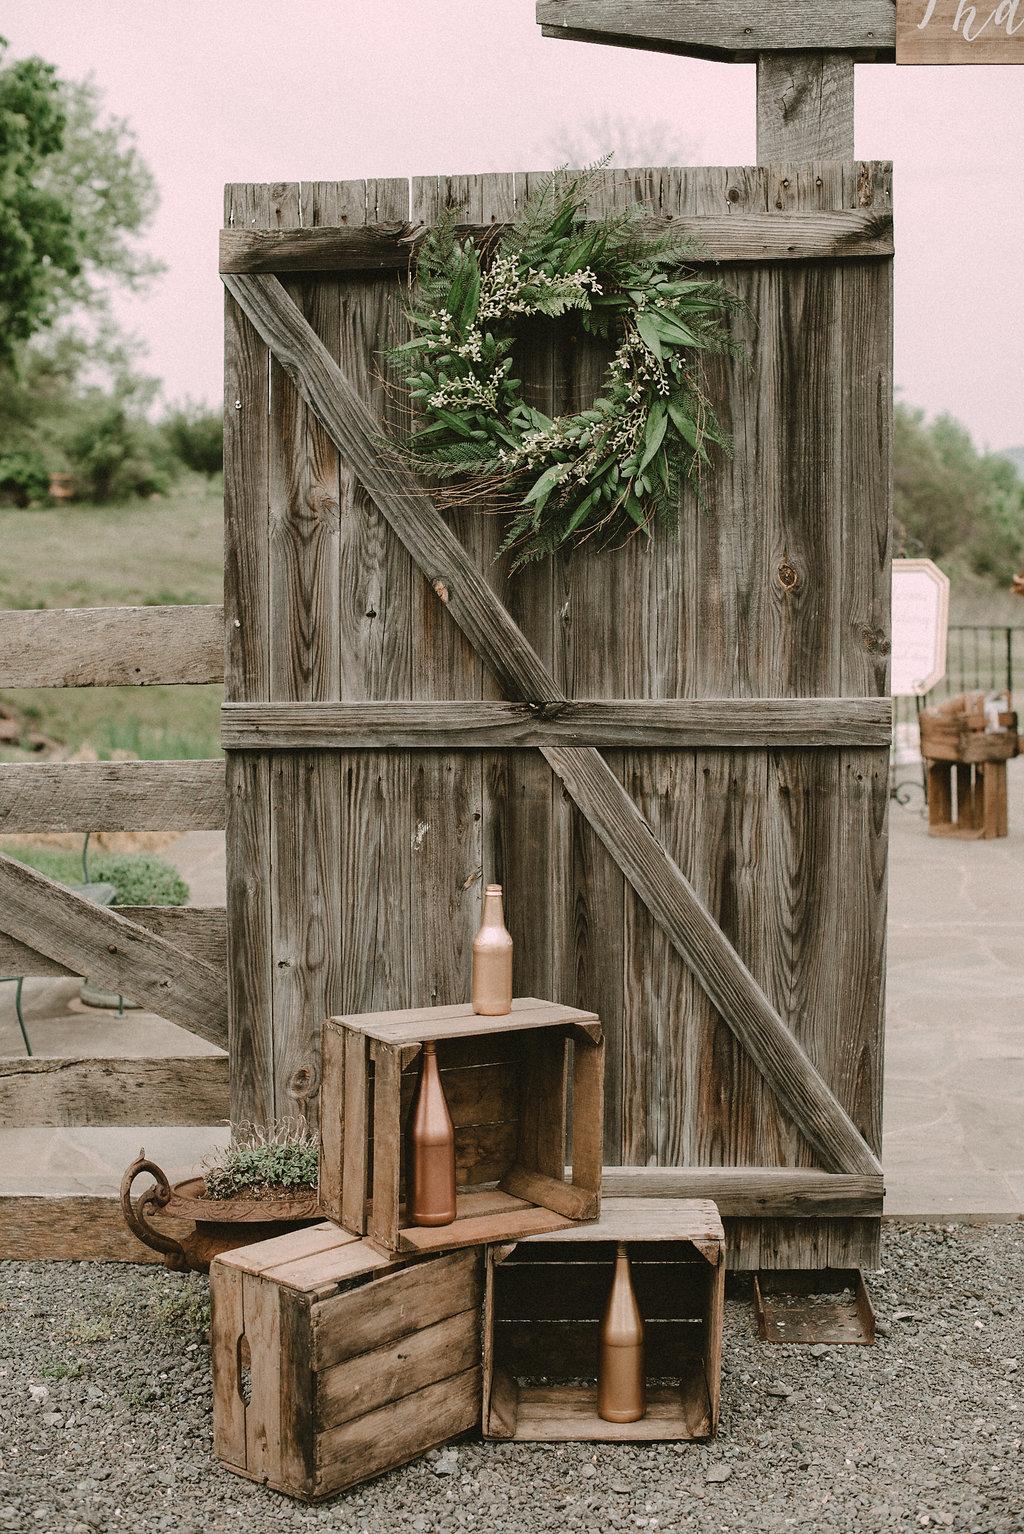 ceremony decor at vintage riverside on the Potomac wedding photo